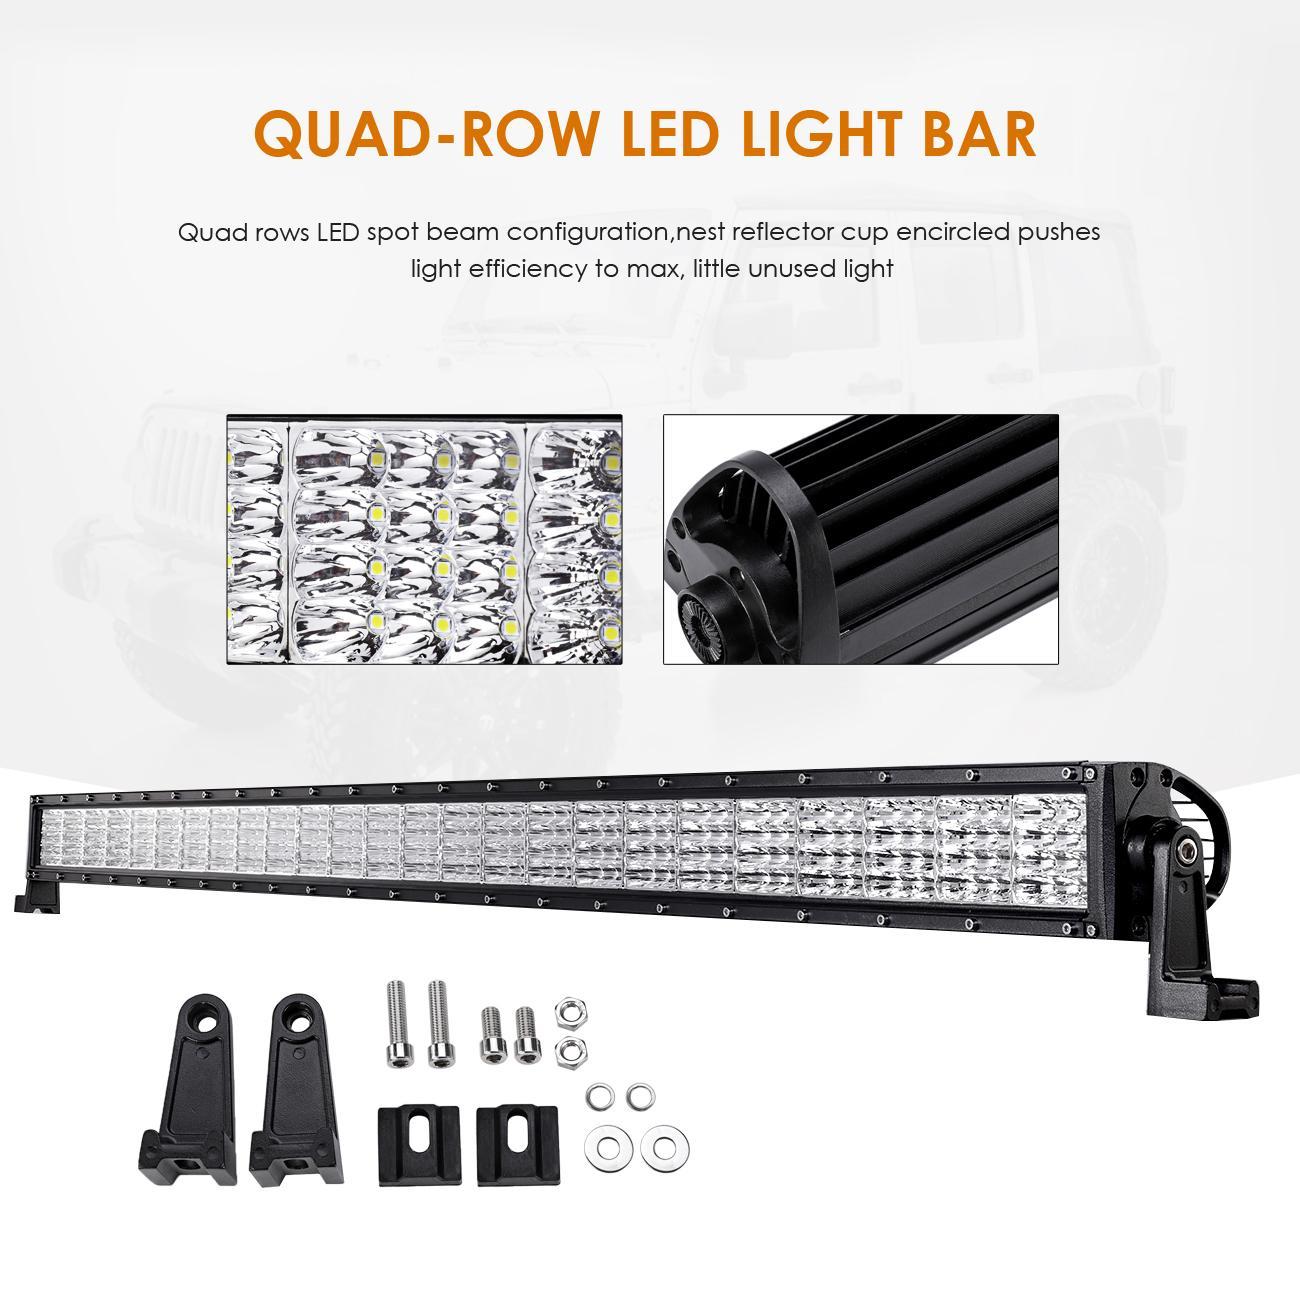 52 W Quad Row 4x 4 Pods Cree Led Light Bar Mounts